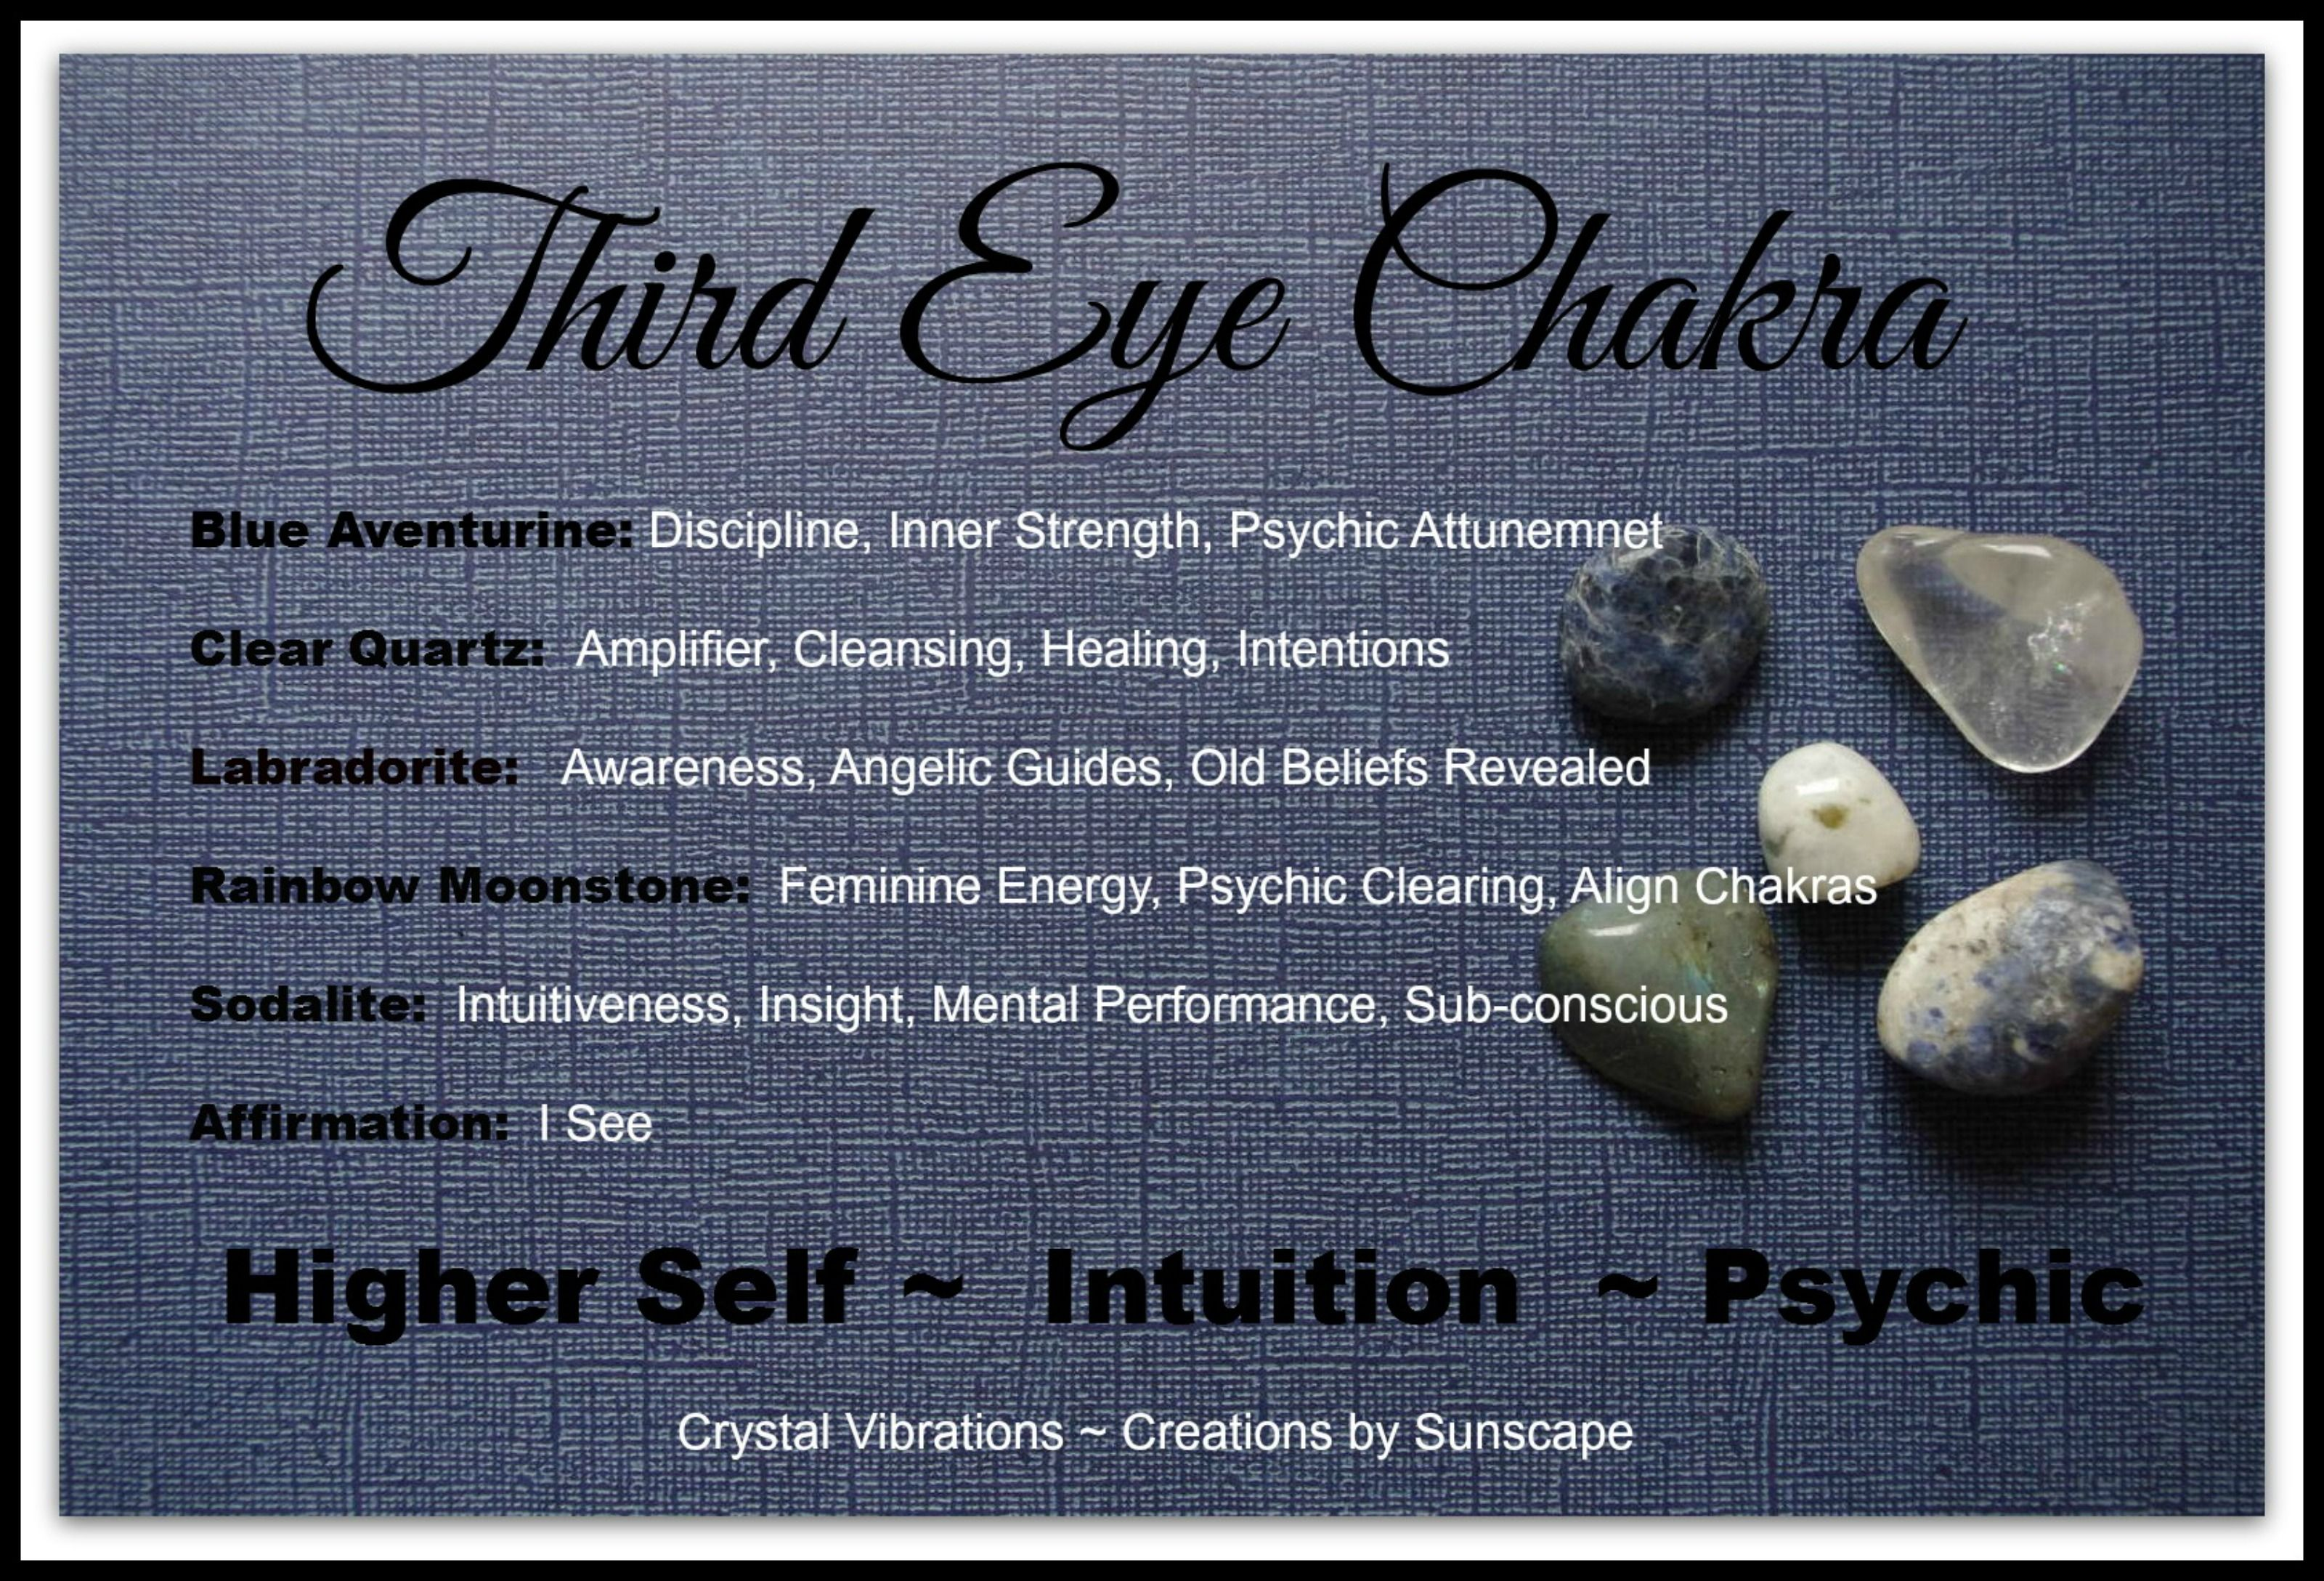 Fotodruck Chakra Meditation amp Mudra Mantra Meditation Yoga